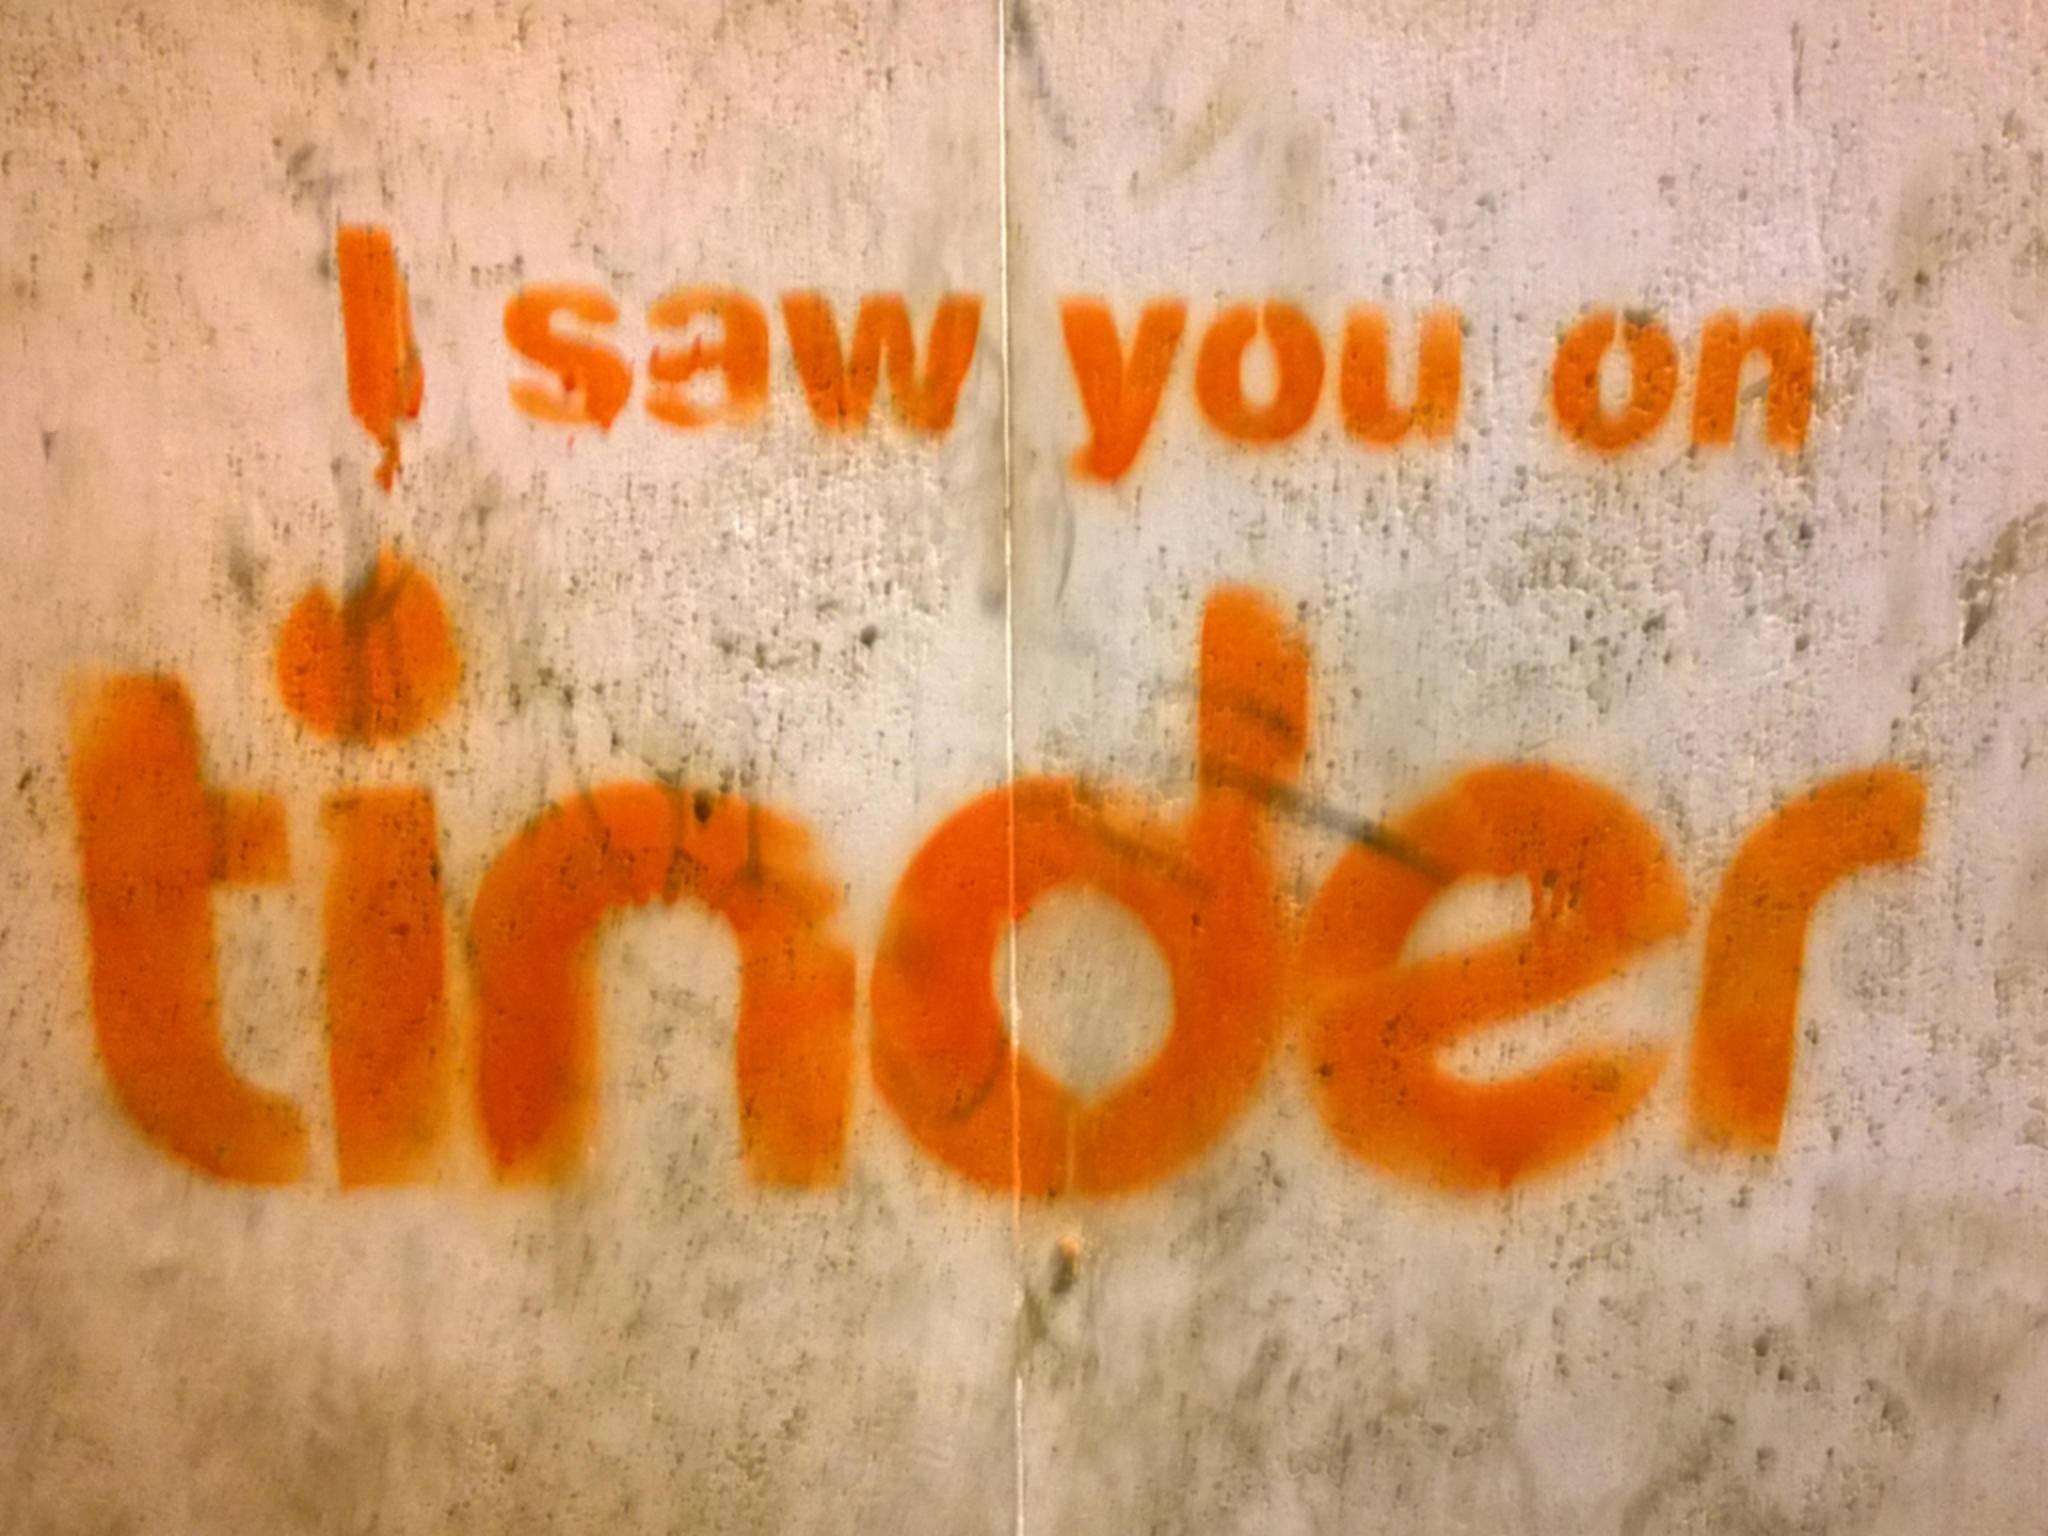 Die Dating-App Tinder hat den Foto-Messenger Tappy übernommen.